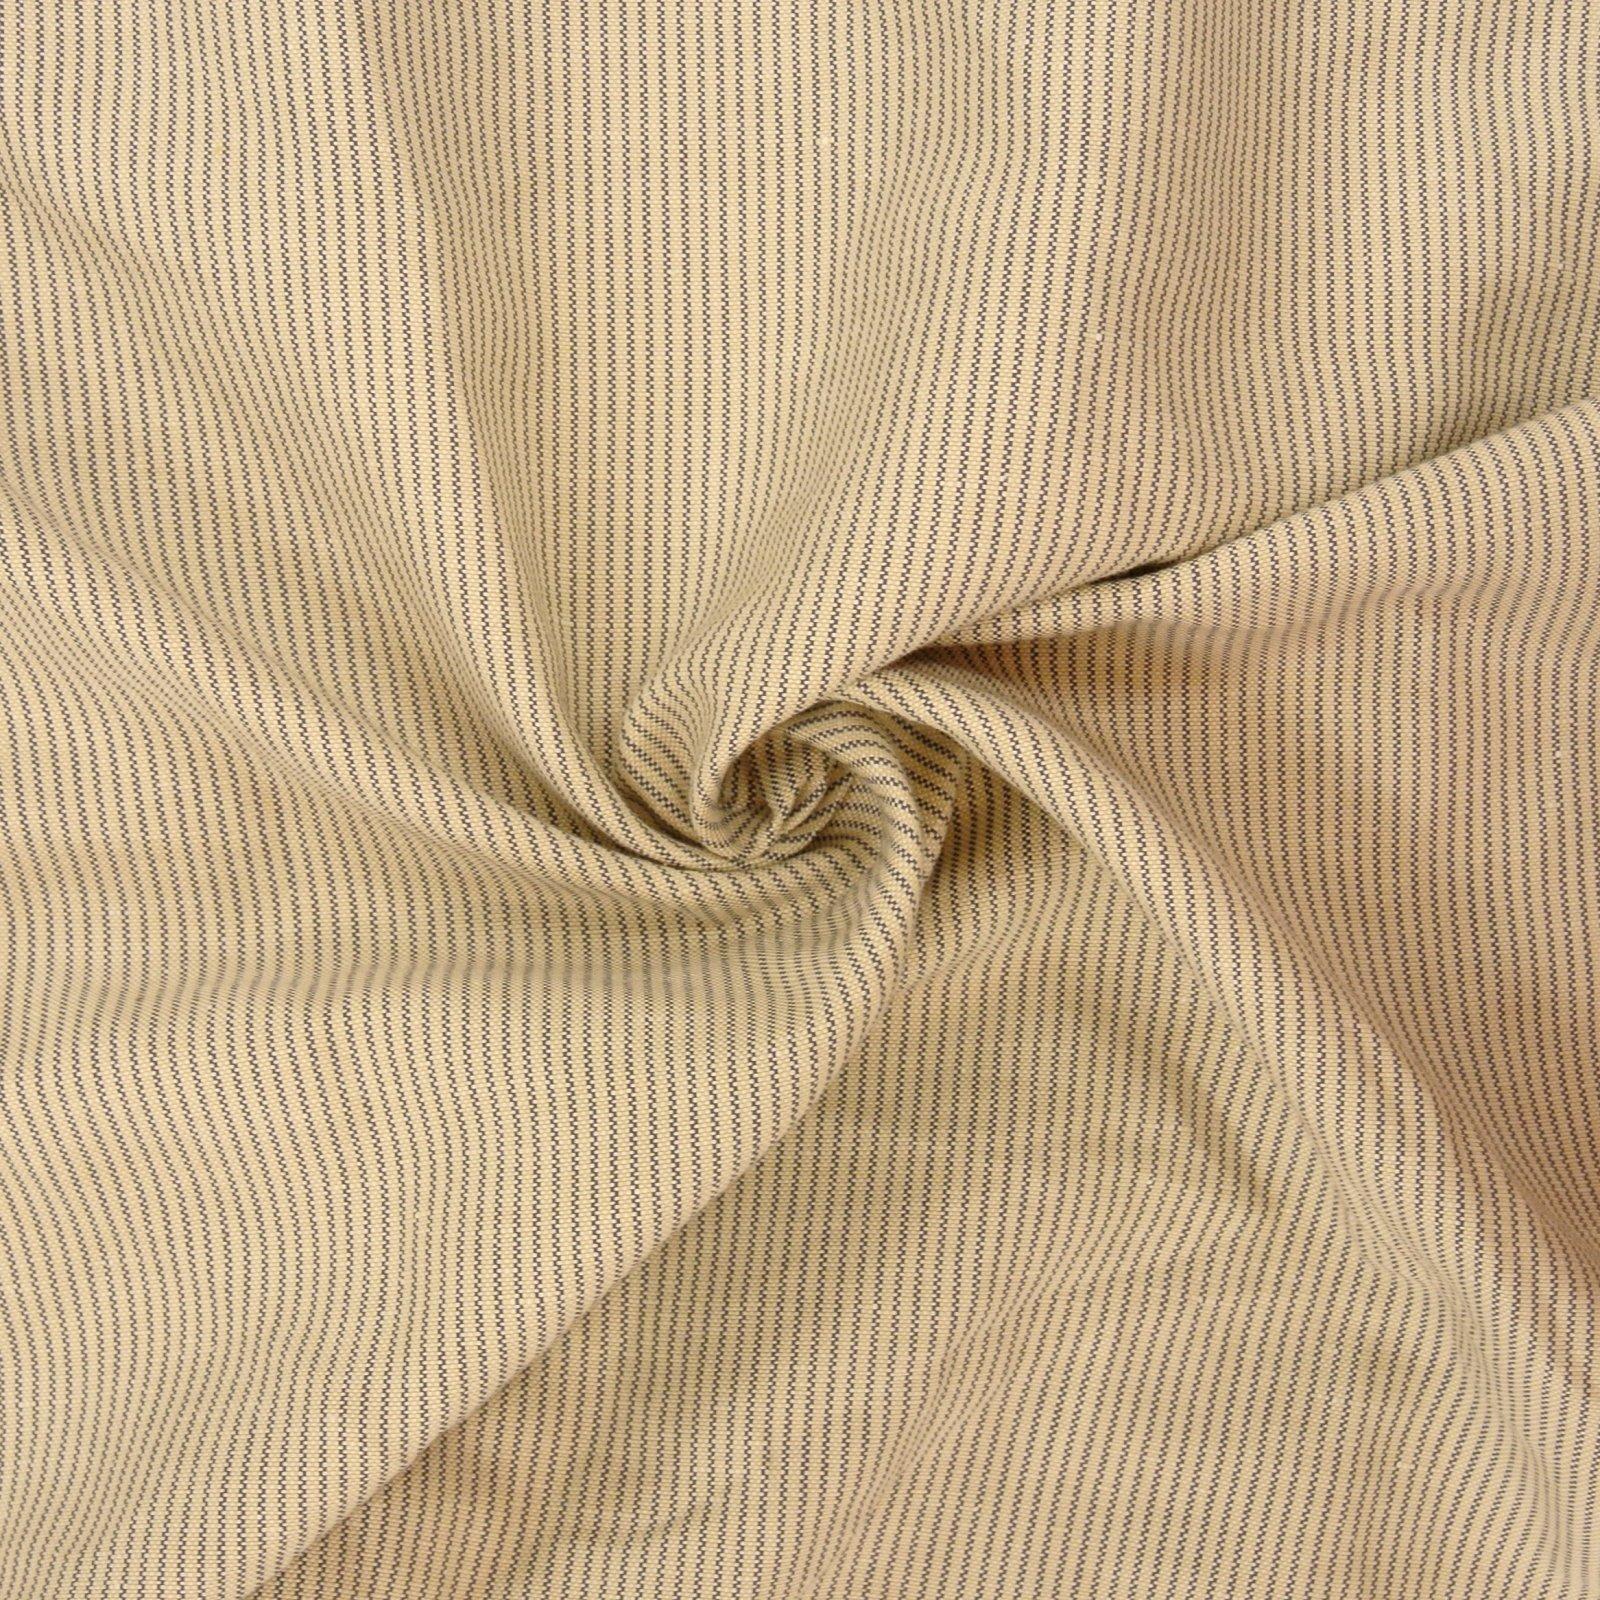 Linen Rayon Vertical Stripe Oxford parchment gray